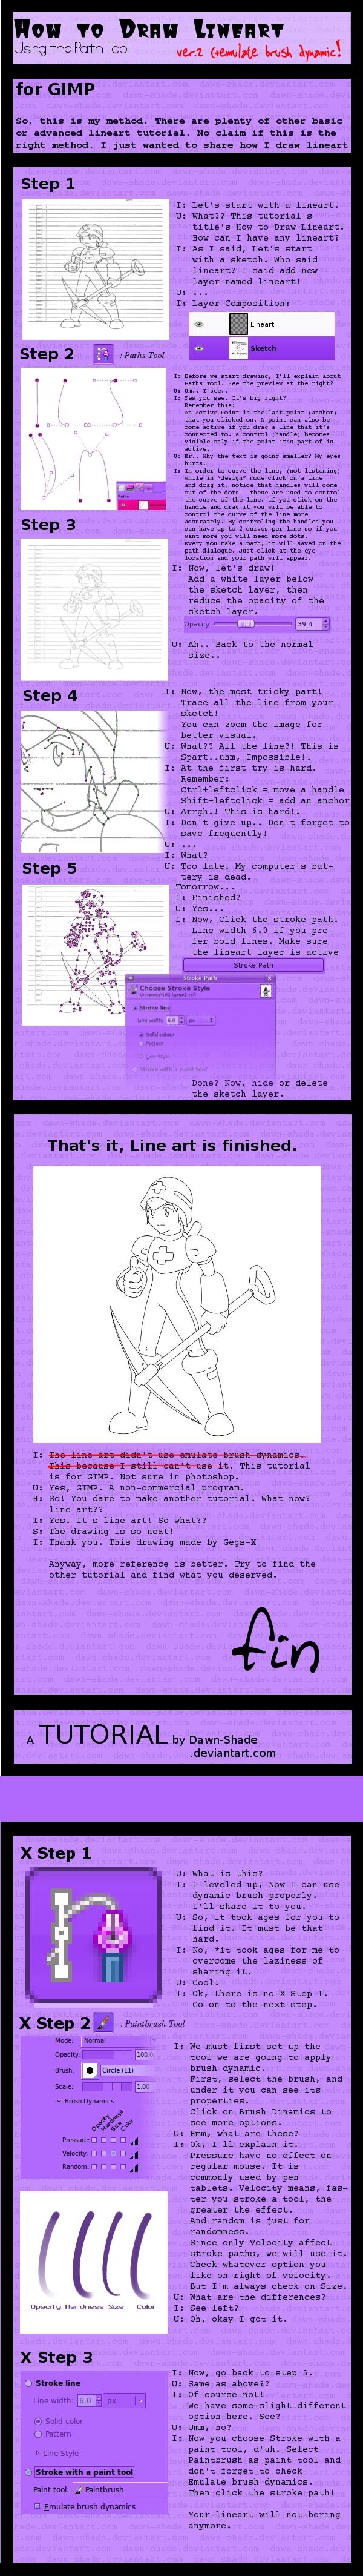 Line Drawing In Gimp : Line art tutorial v using gimp by dawn shade on deviantart